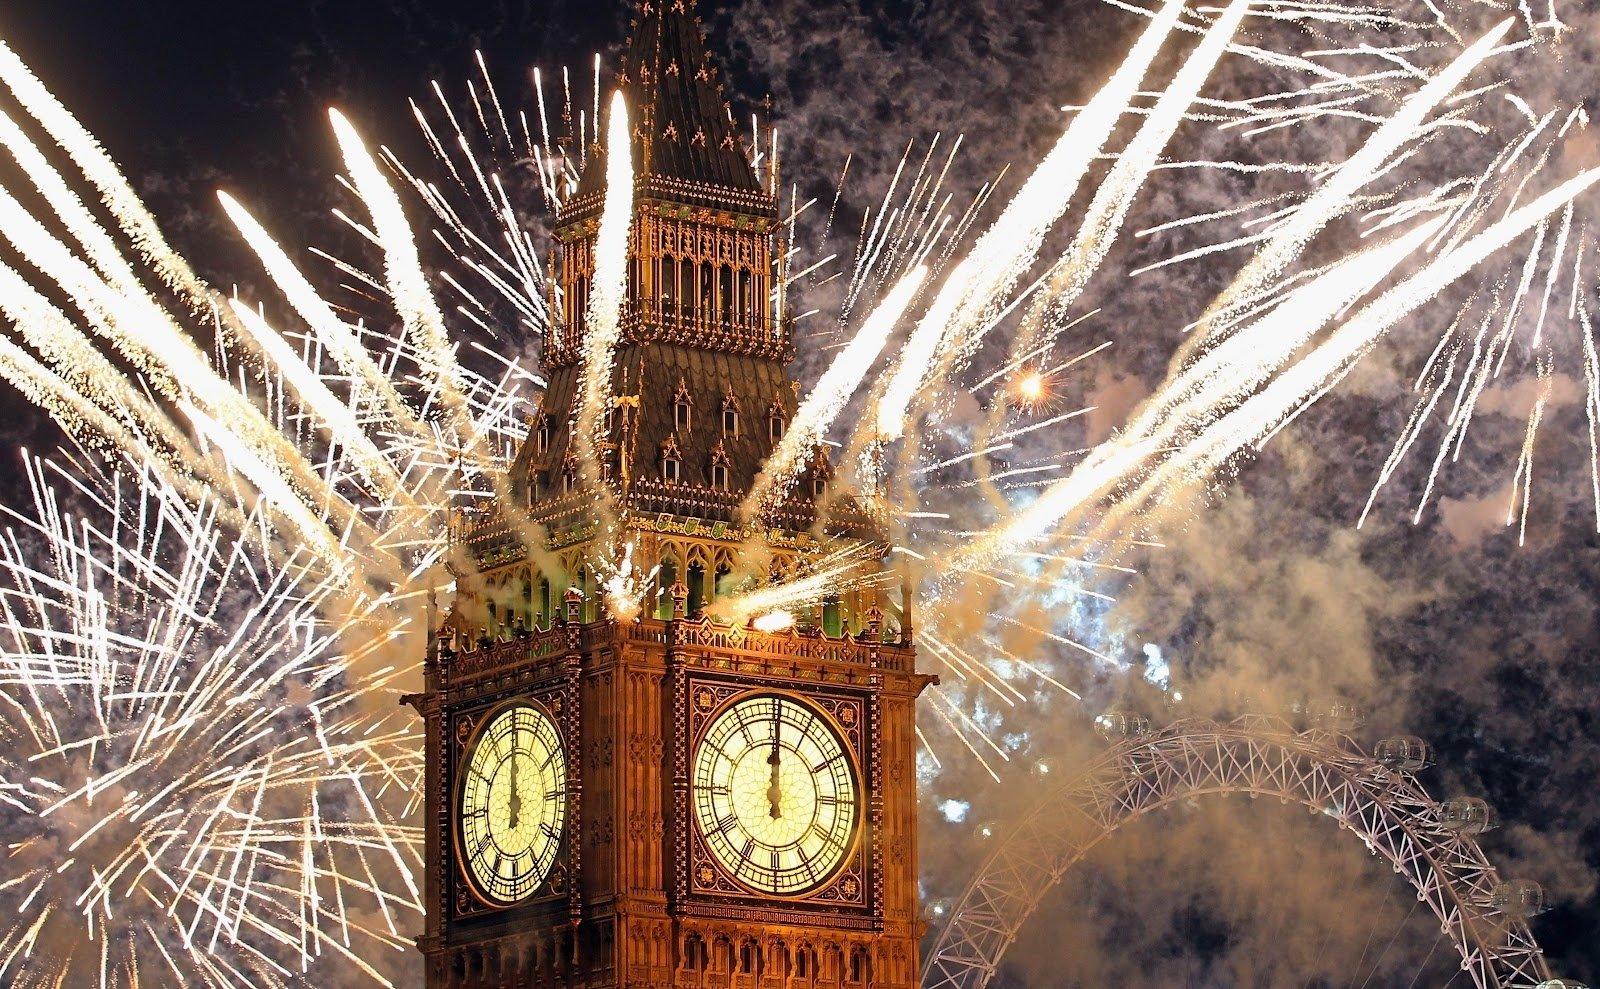 10 Lovely New Years Eve Ideas 2013 nye firework displays 2015 jordans fireworks